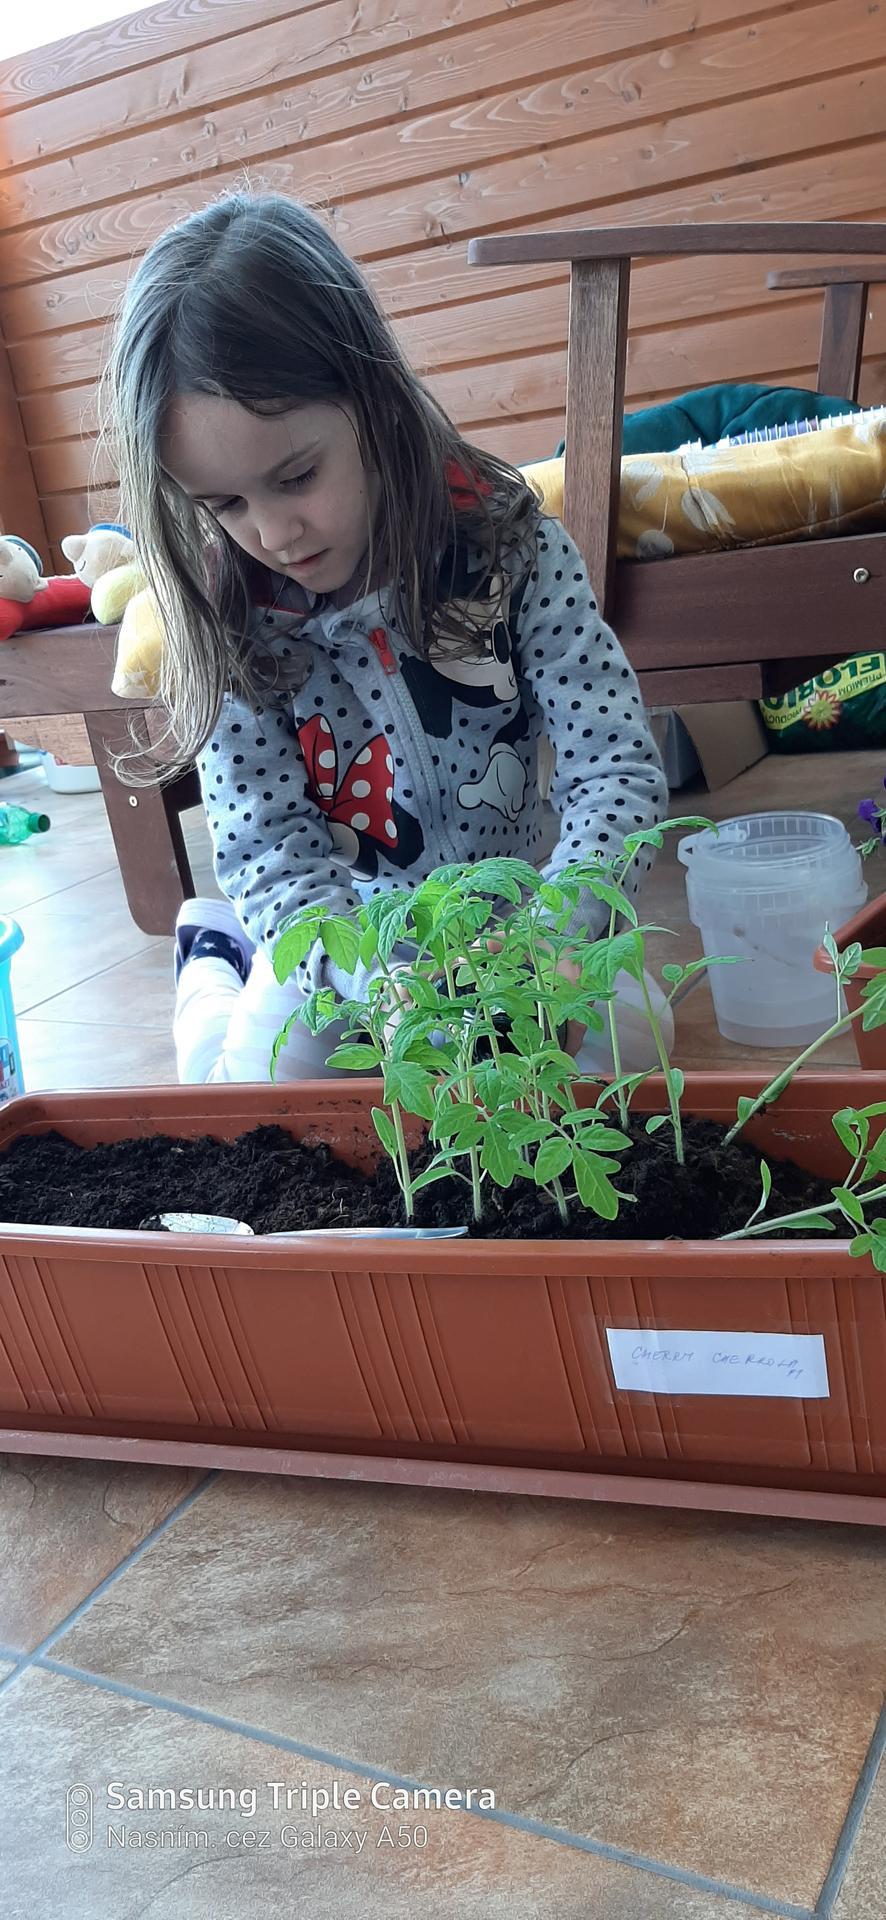 🏠🌞🌺❤🌷 Zahrada a jej dalsi rok...2020 🌱🐞🐛🦋🍓🥕🍅🌺❤ - Mala pomocnicka.